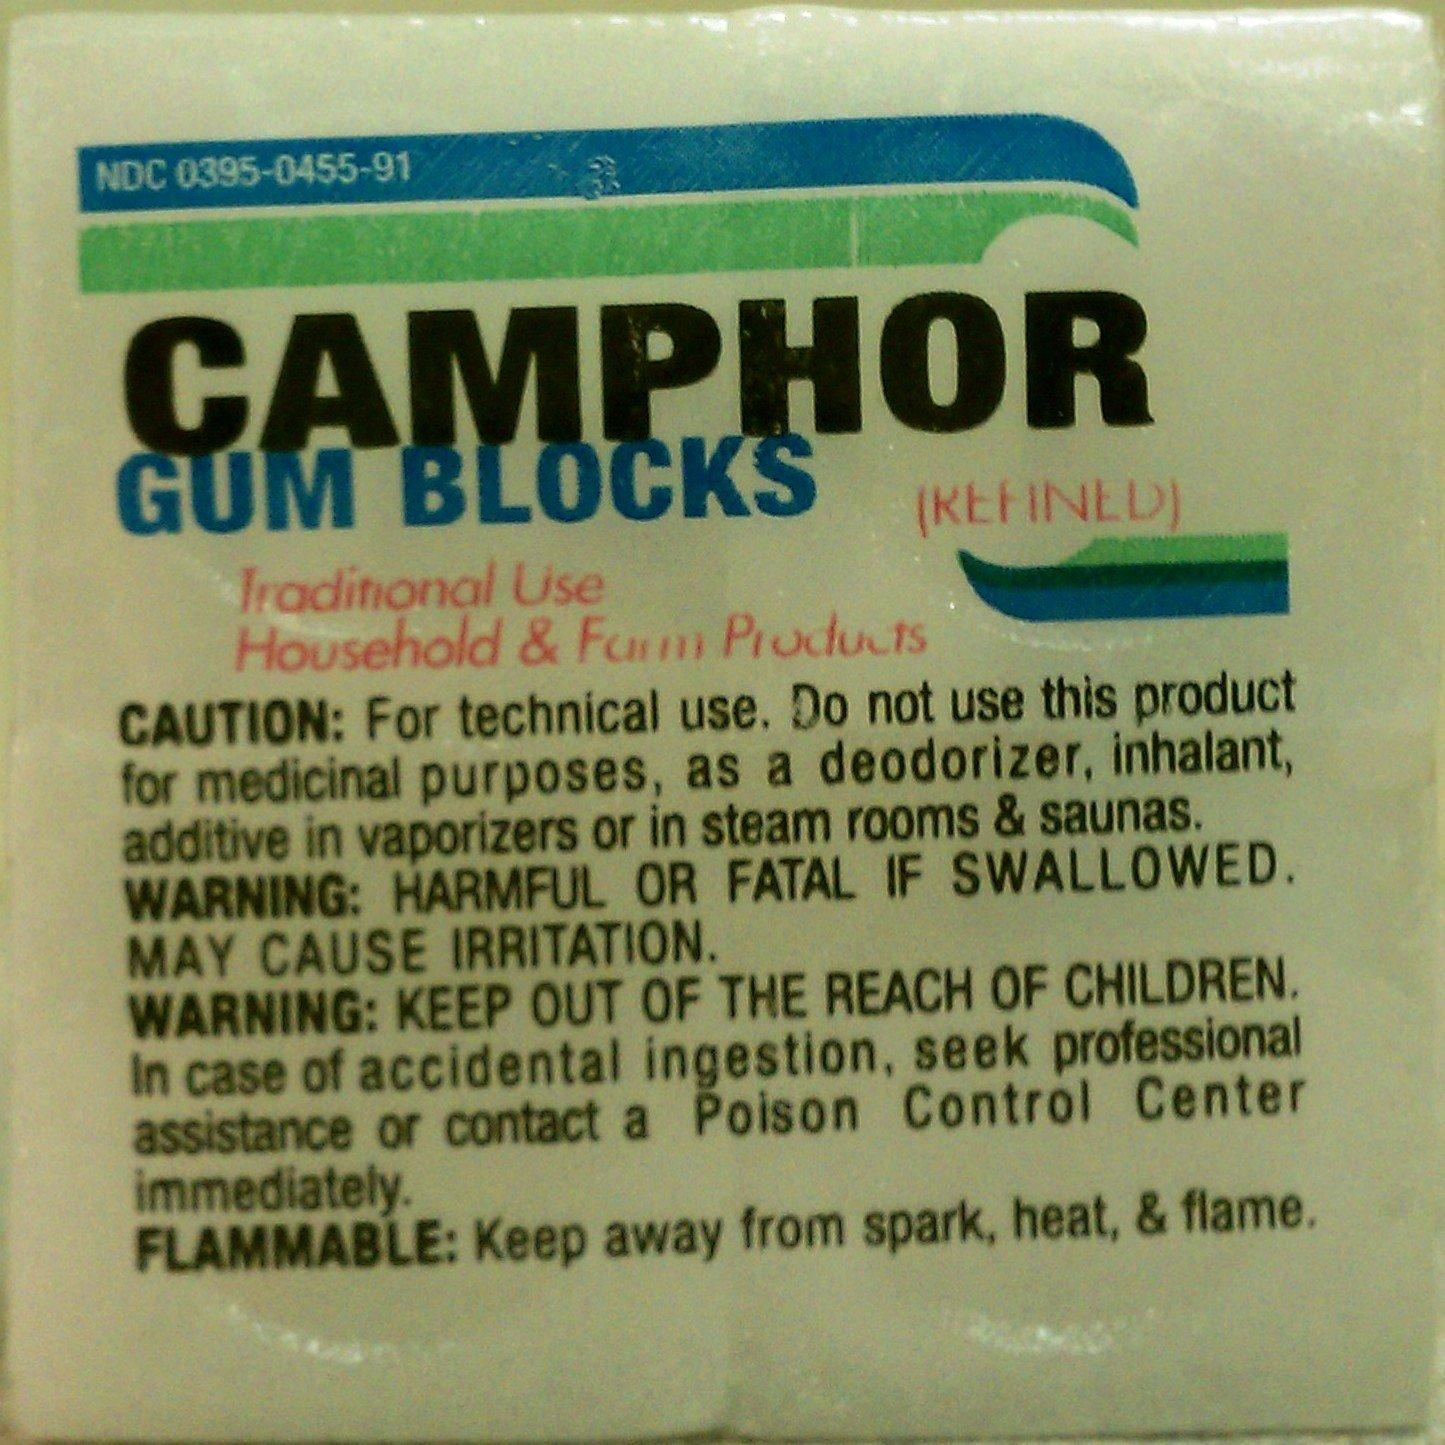 Camphor Gum Blocks 1oz block by Humco